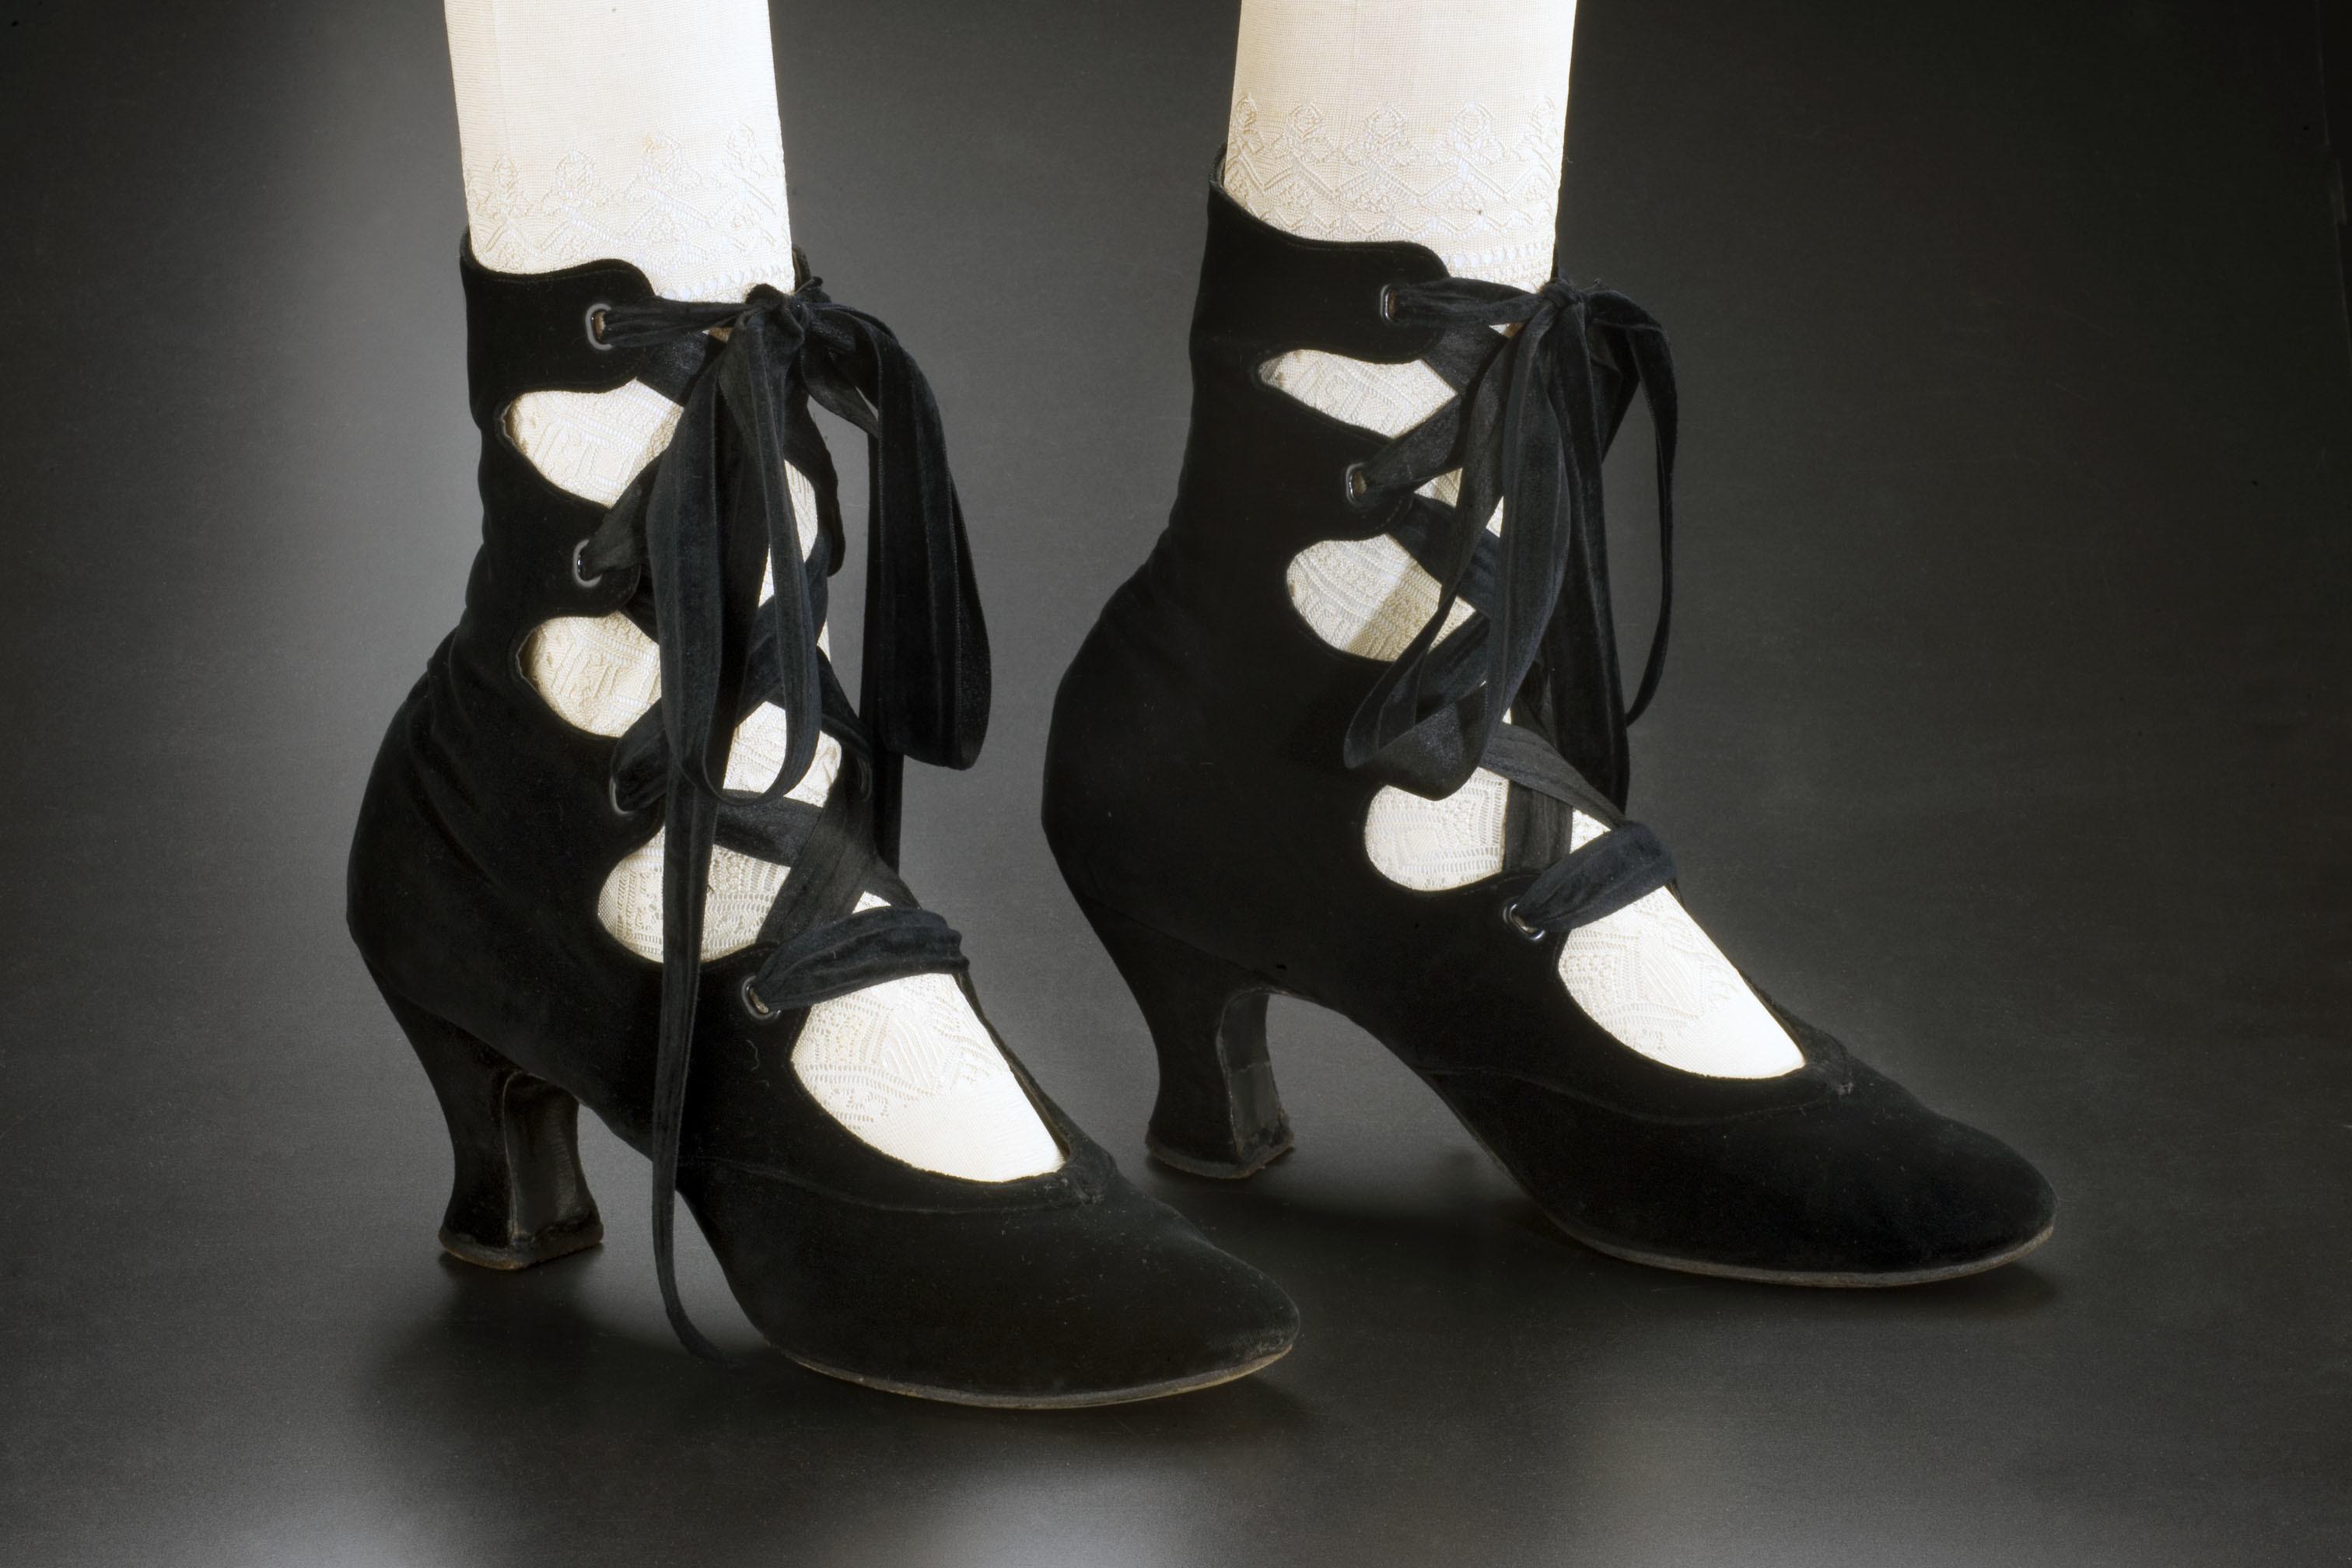 File:Tango shoes, black satin, 1910.jpg